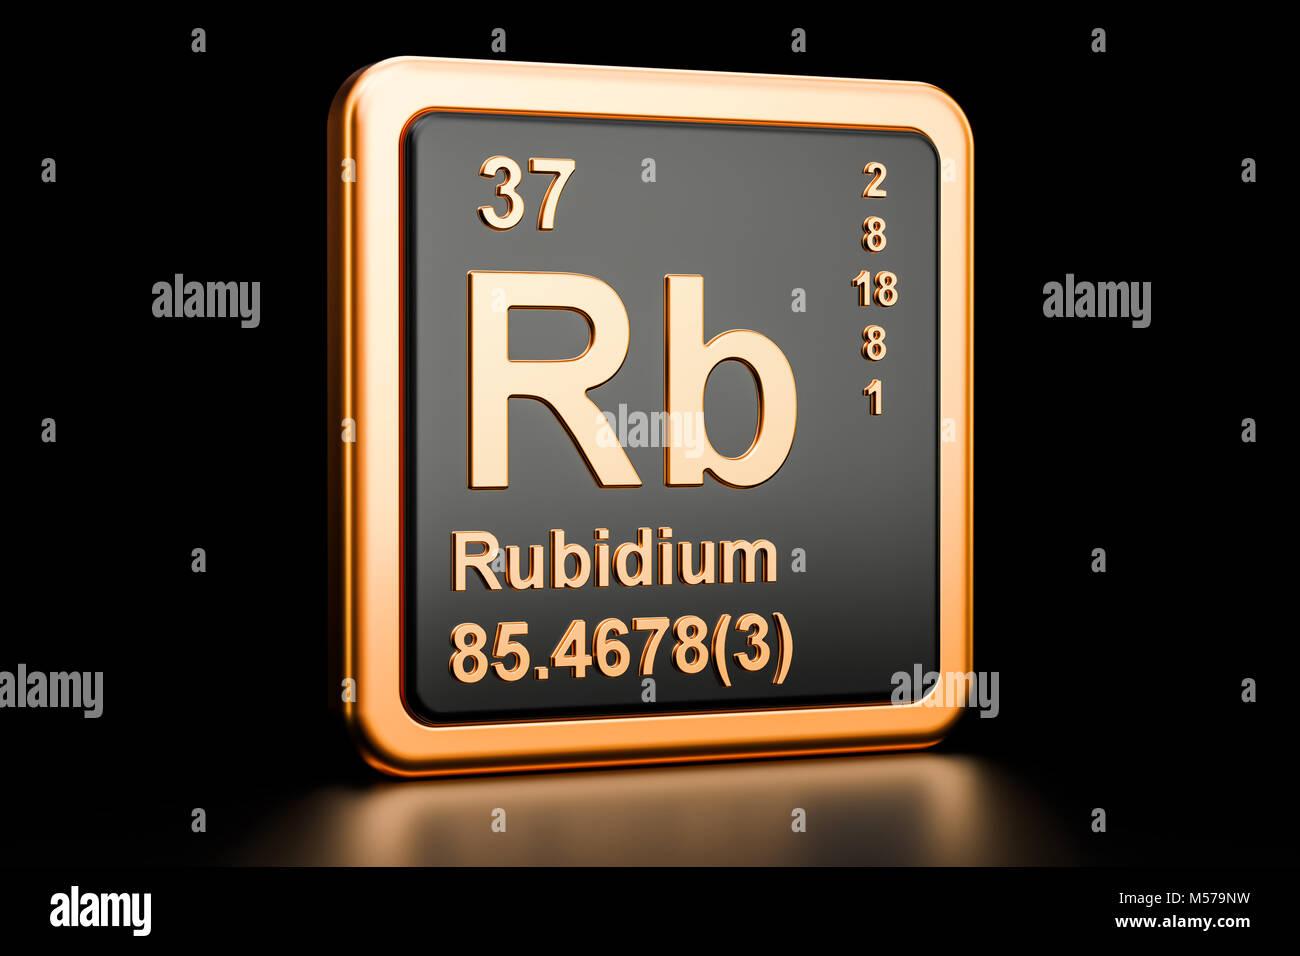 Rubidium rb chemical element 3d rendering isolated on black stock rubidium rb chemical element 3d rendering isolated on black background buycottarizona Choice Image